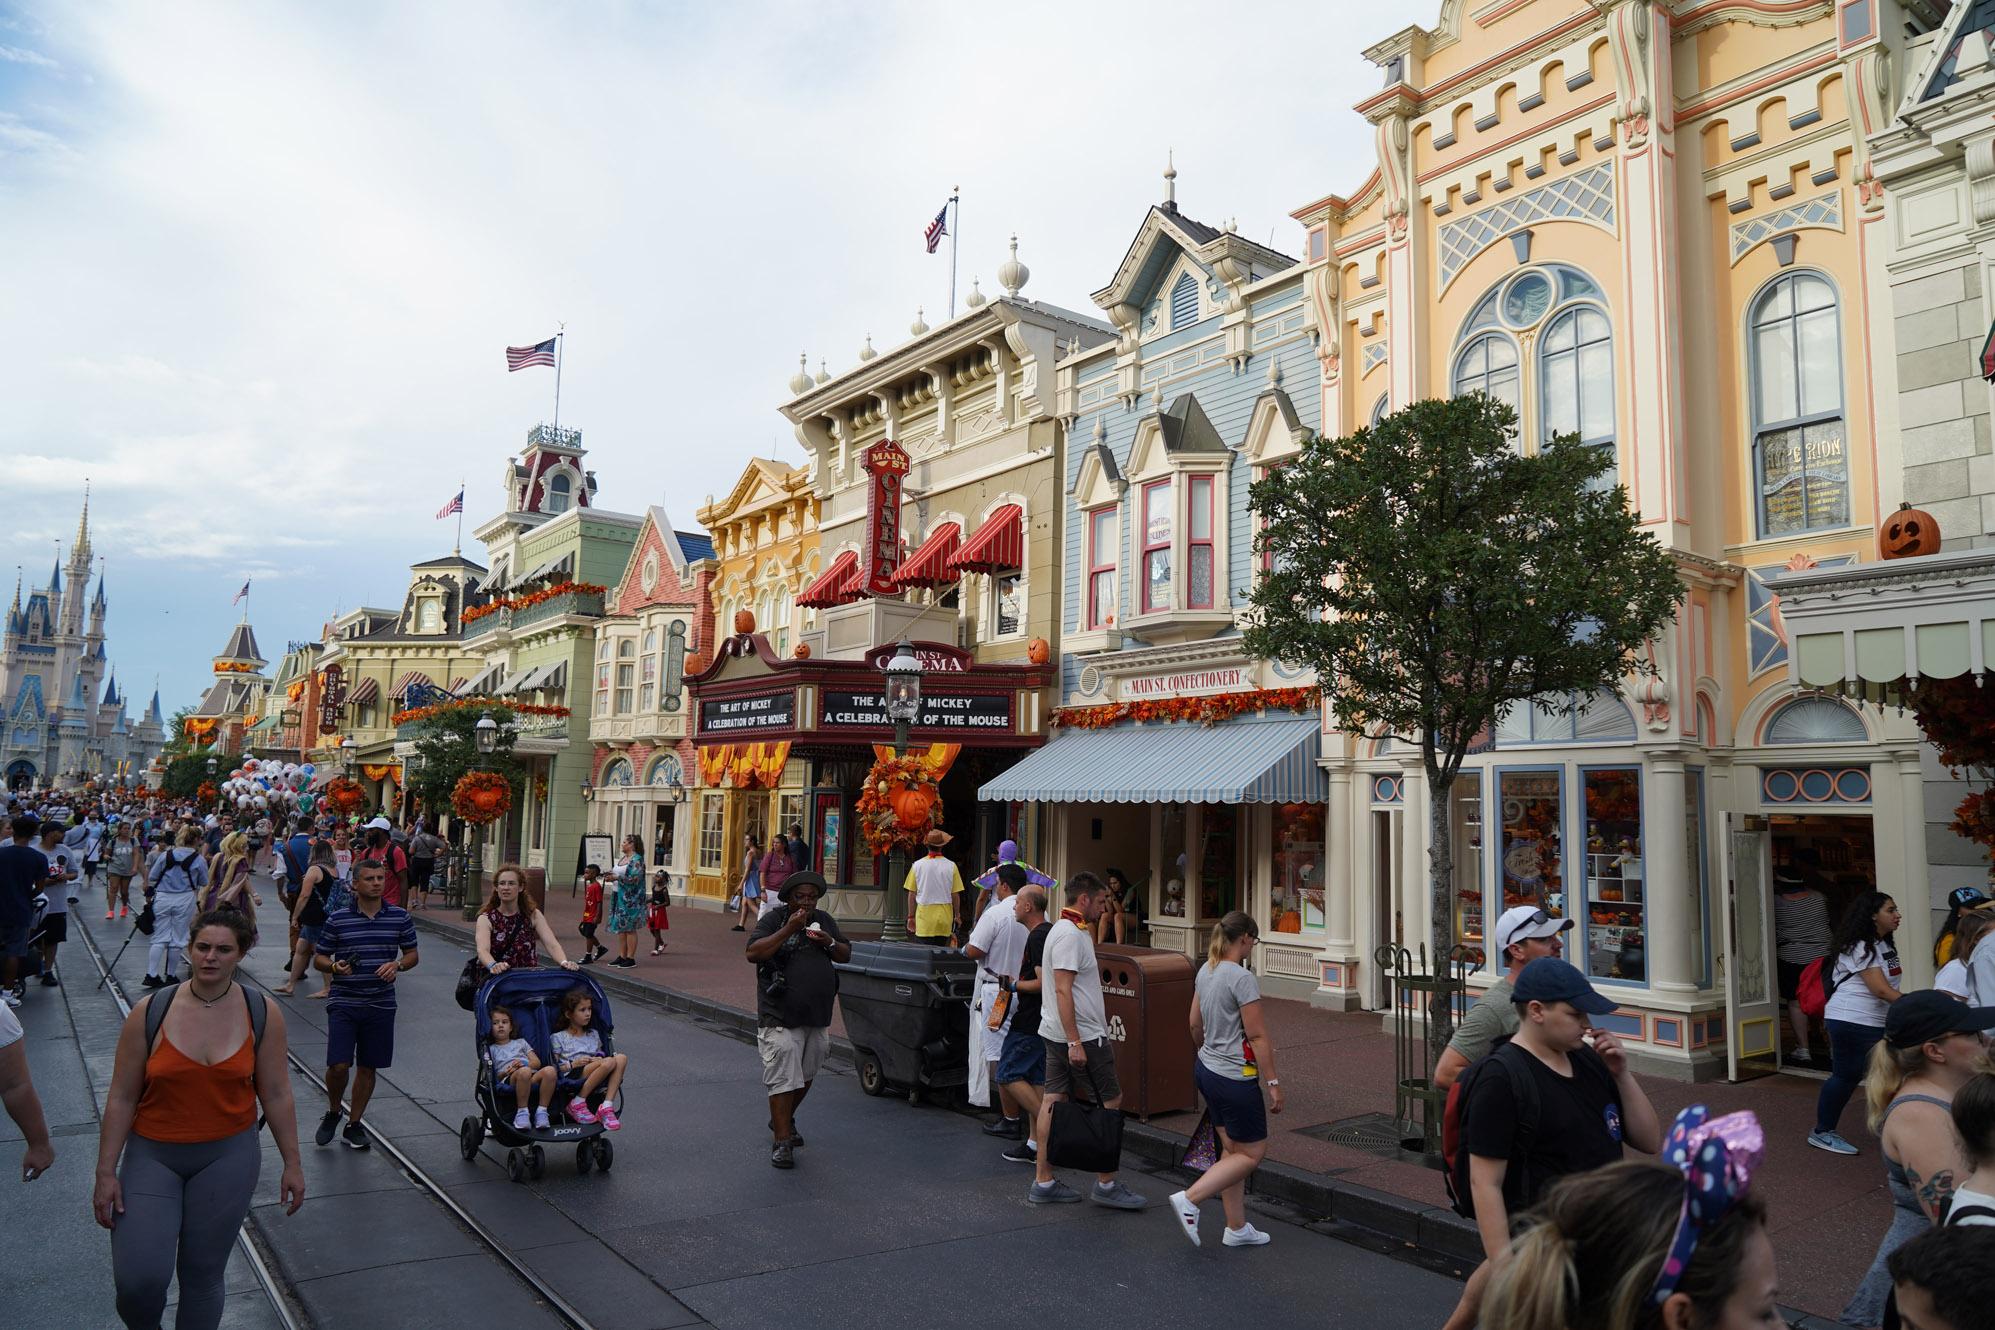 [%Disney World Map [2021 Maps: Resorts, Theme Parks, Water|List Of Rides At Disney World 2021|List Of Rides At Disney World 2021%]